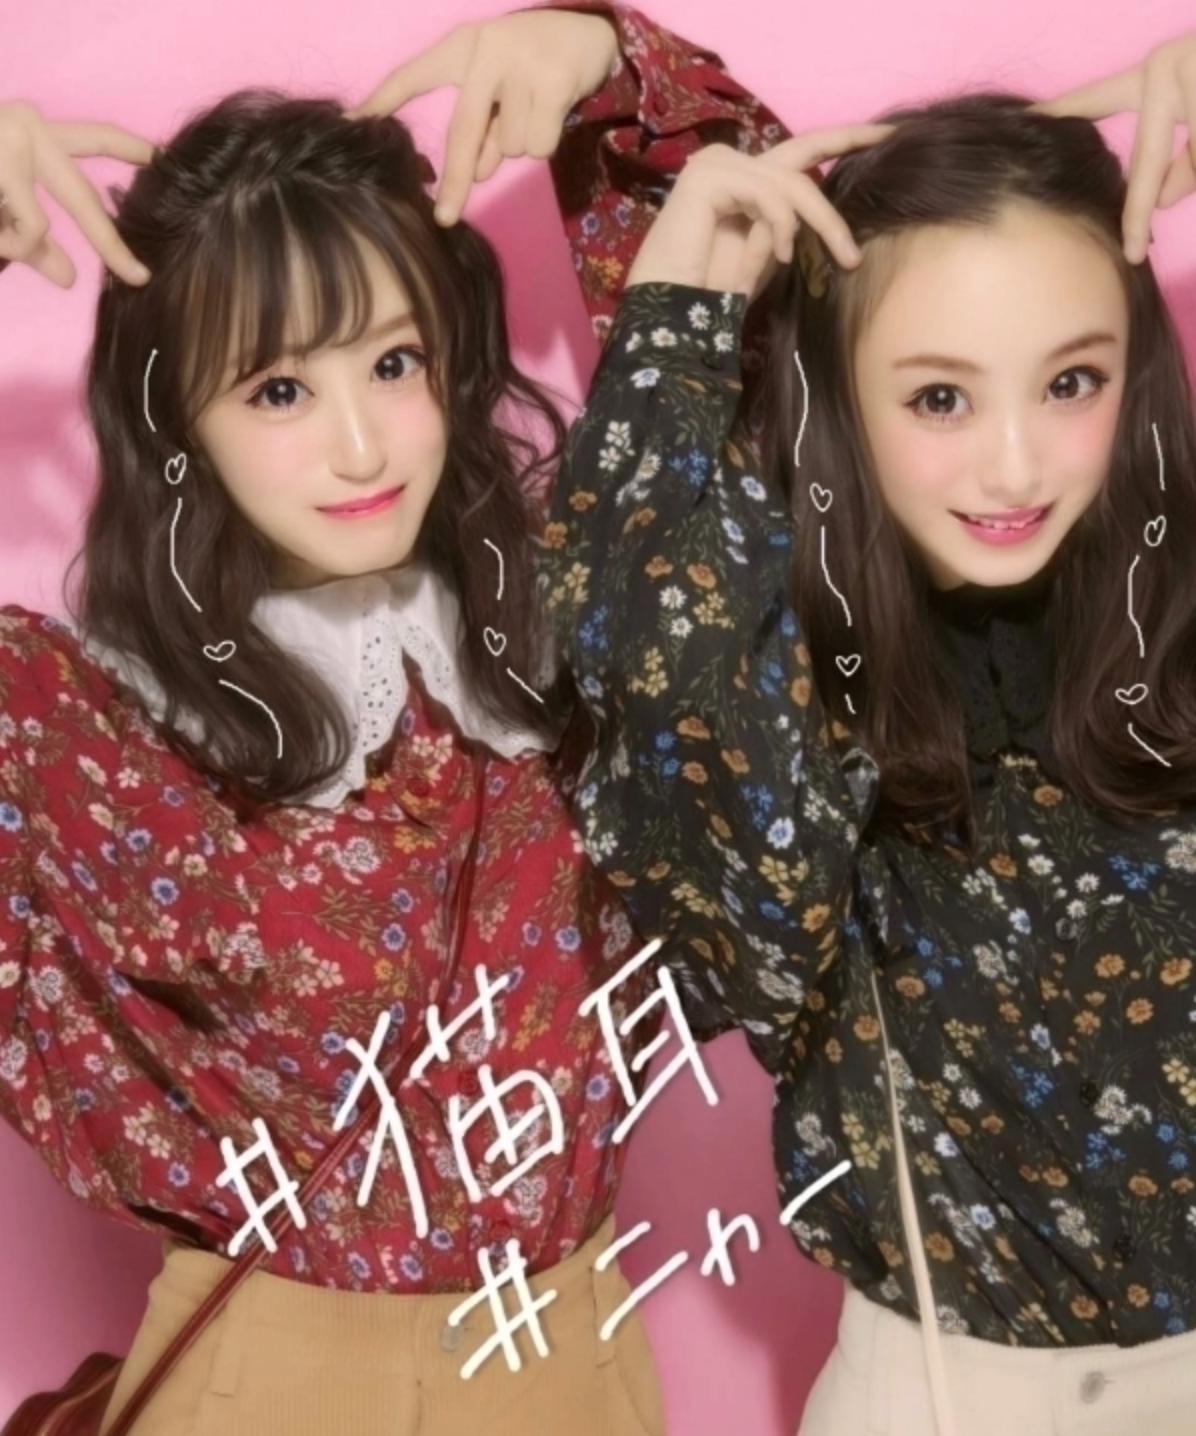 Japanese Purikura Poses - Cat Ears